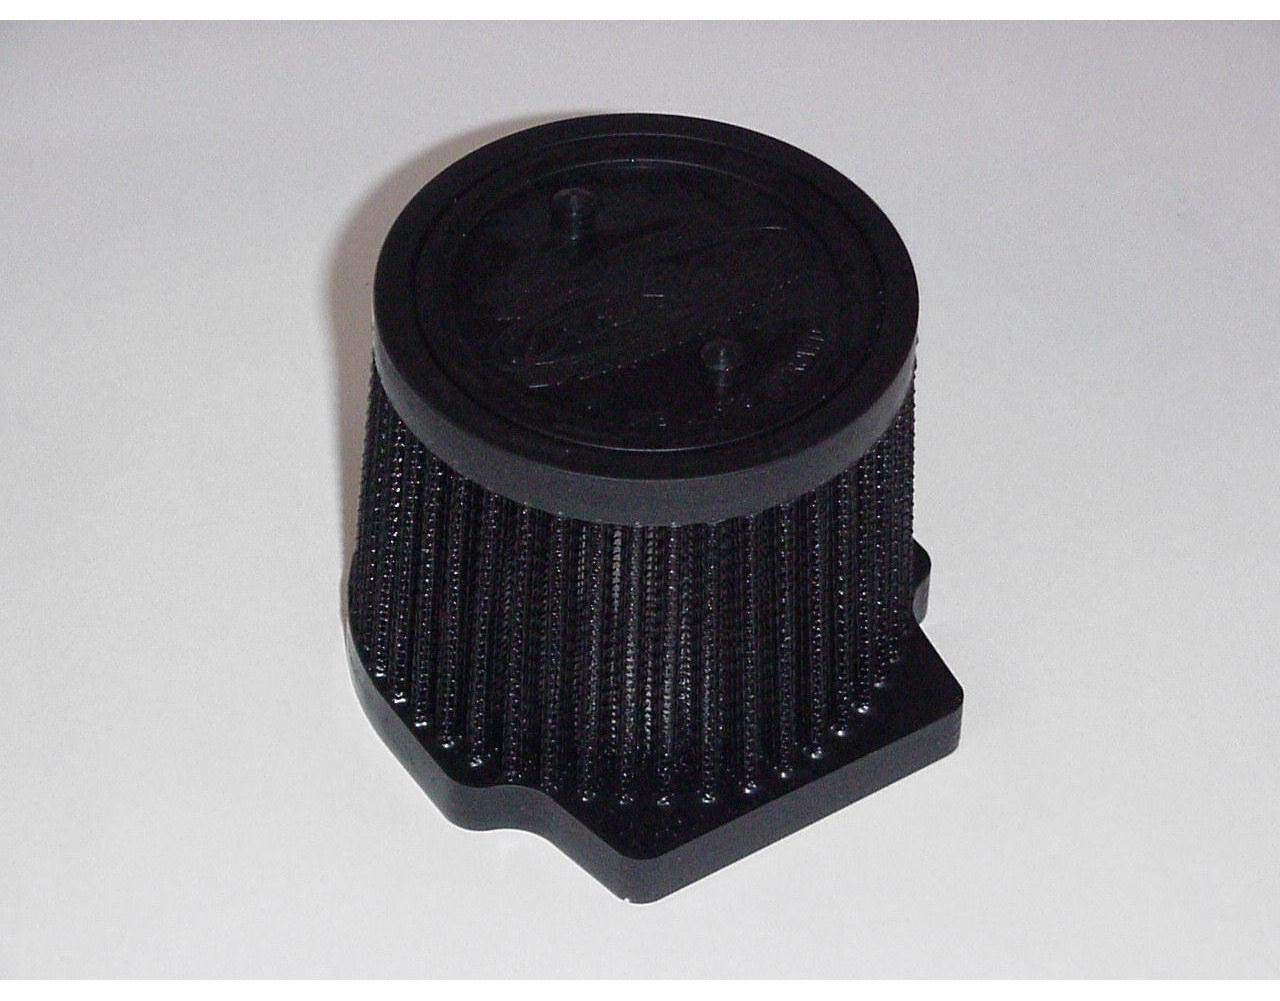 PN:R-KT6SM16-0R 16-17 DNA High Performance Air Filter for Husqvarna Enduro 701